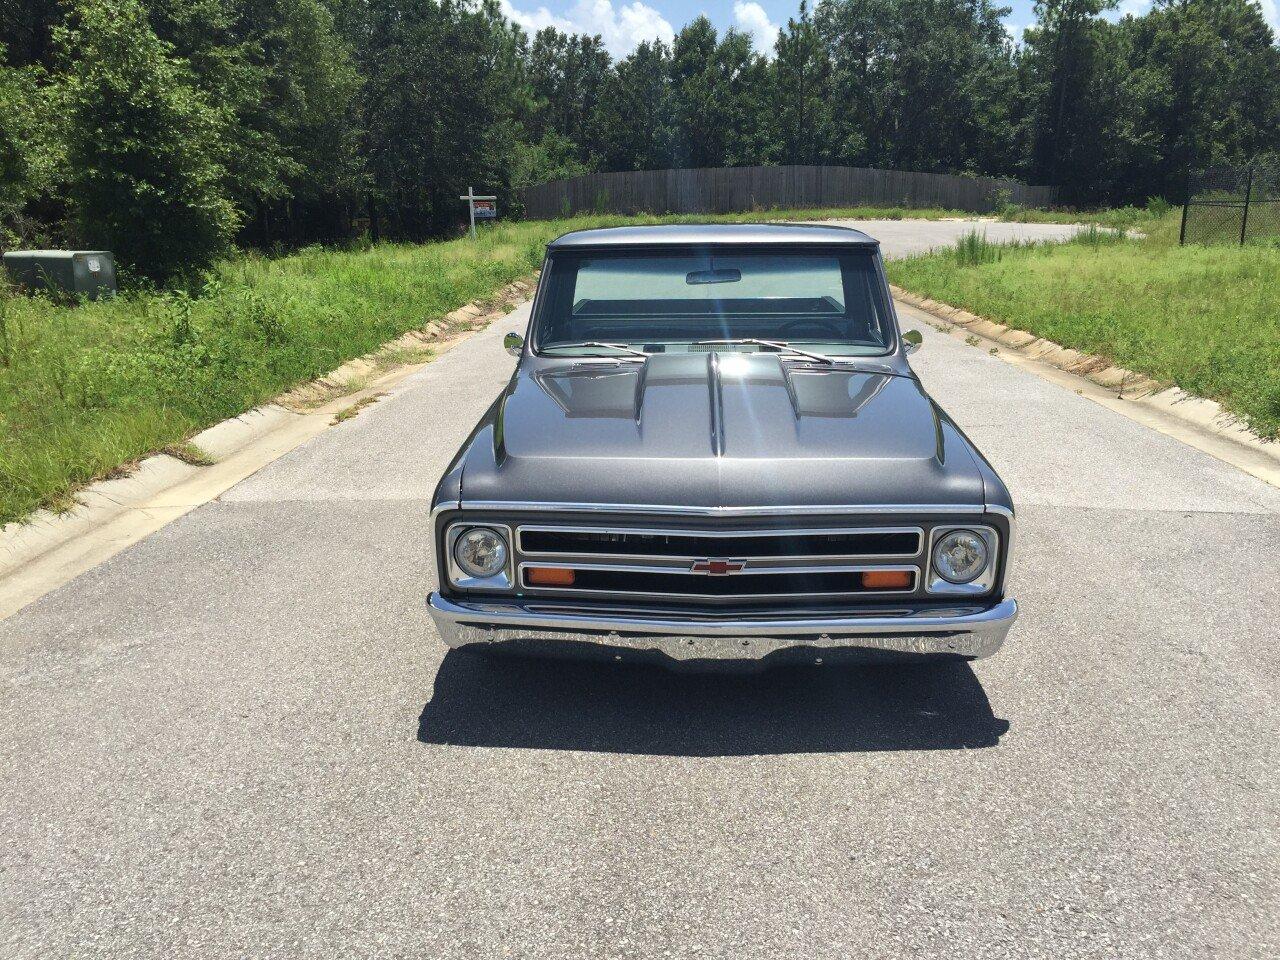 Classic Cars For Sale Auto Trader Com: 1969 Chevrolet C/K Trucks For Sale Near Milton, Florida